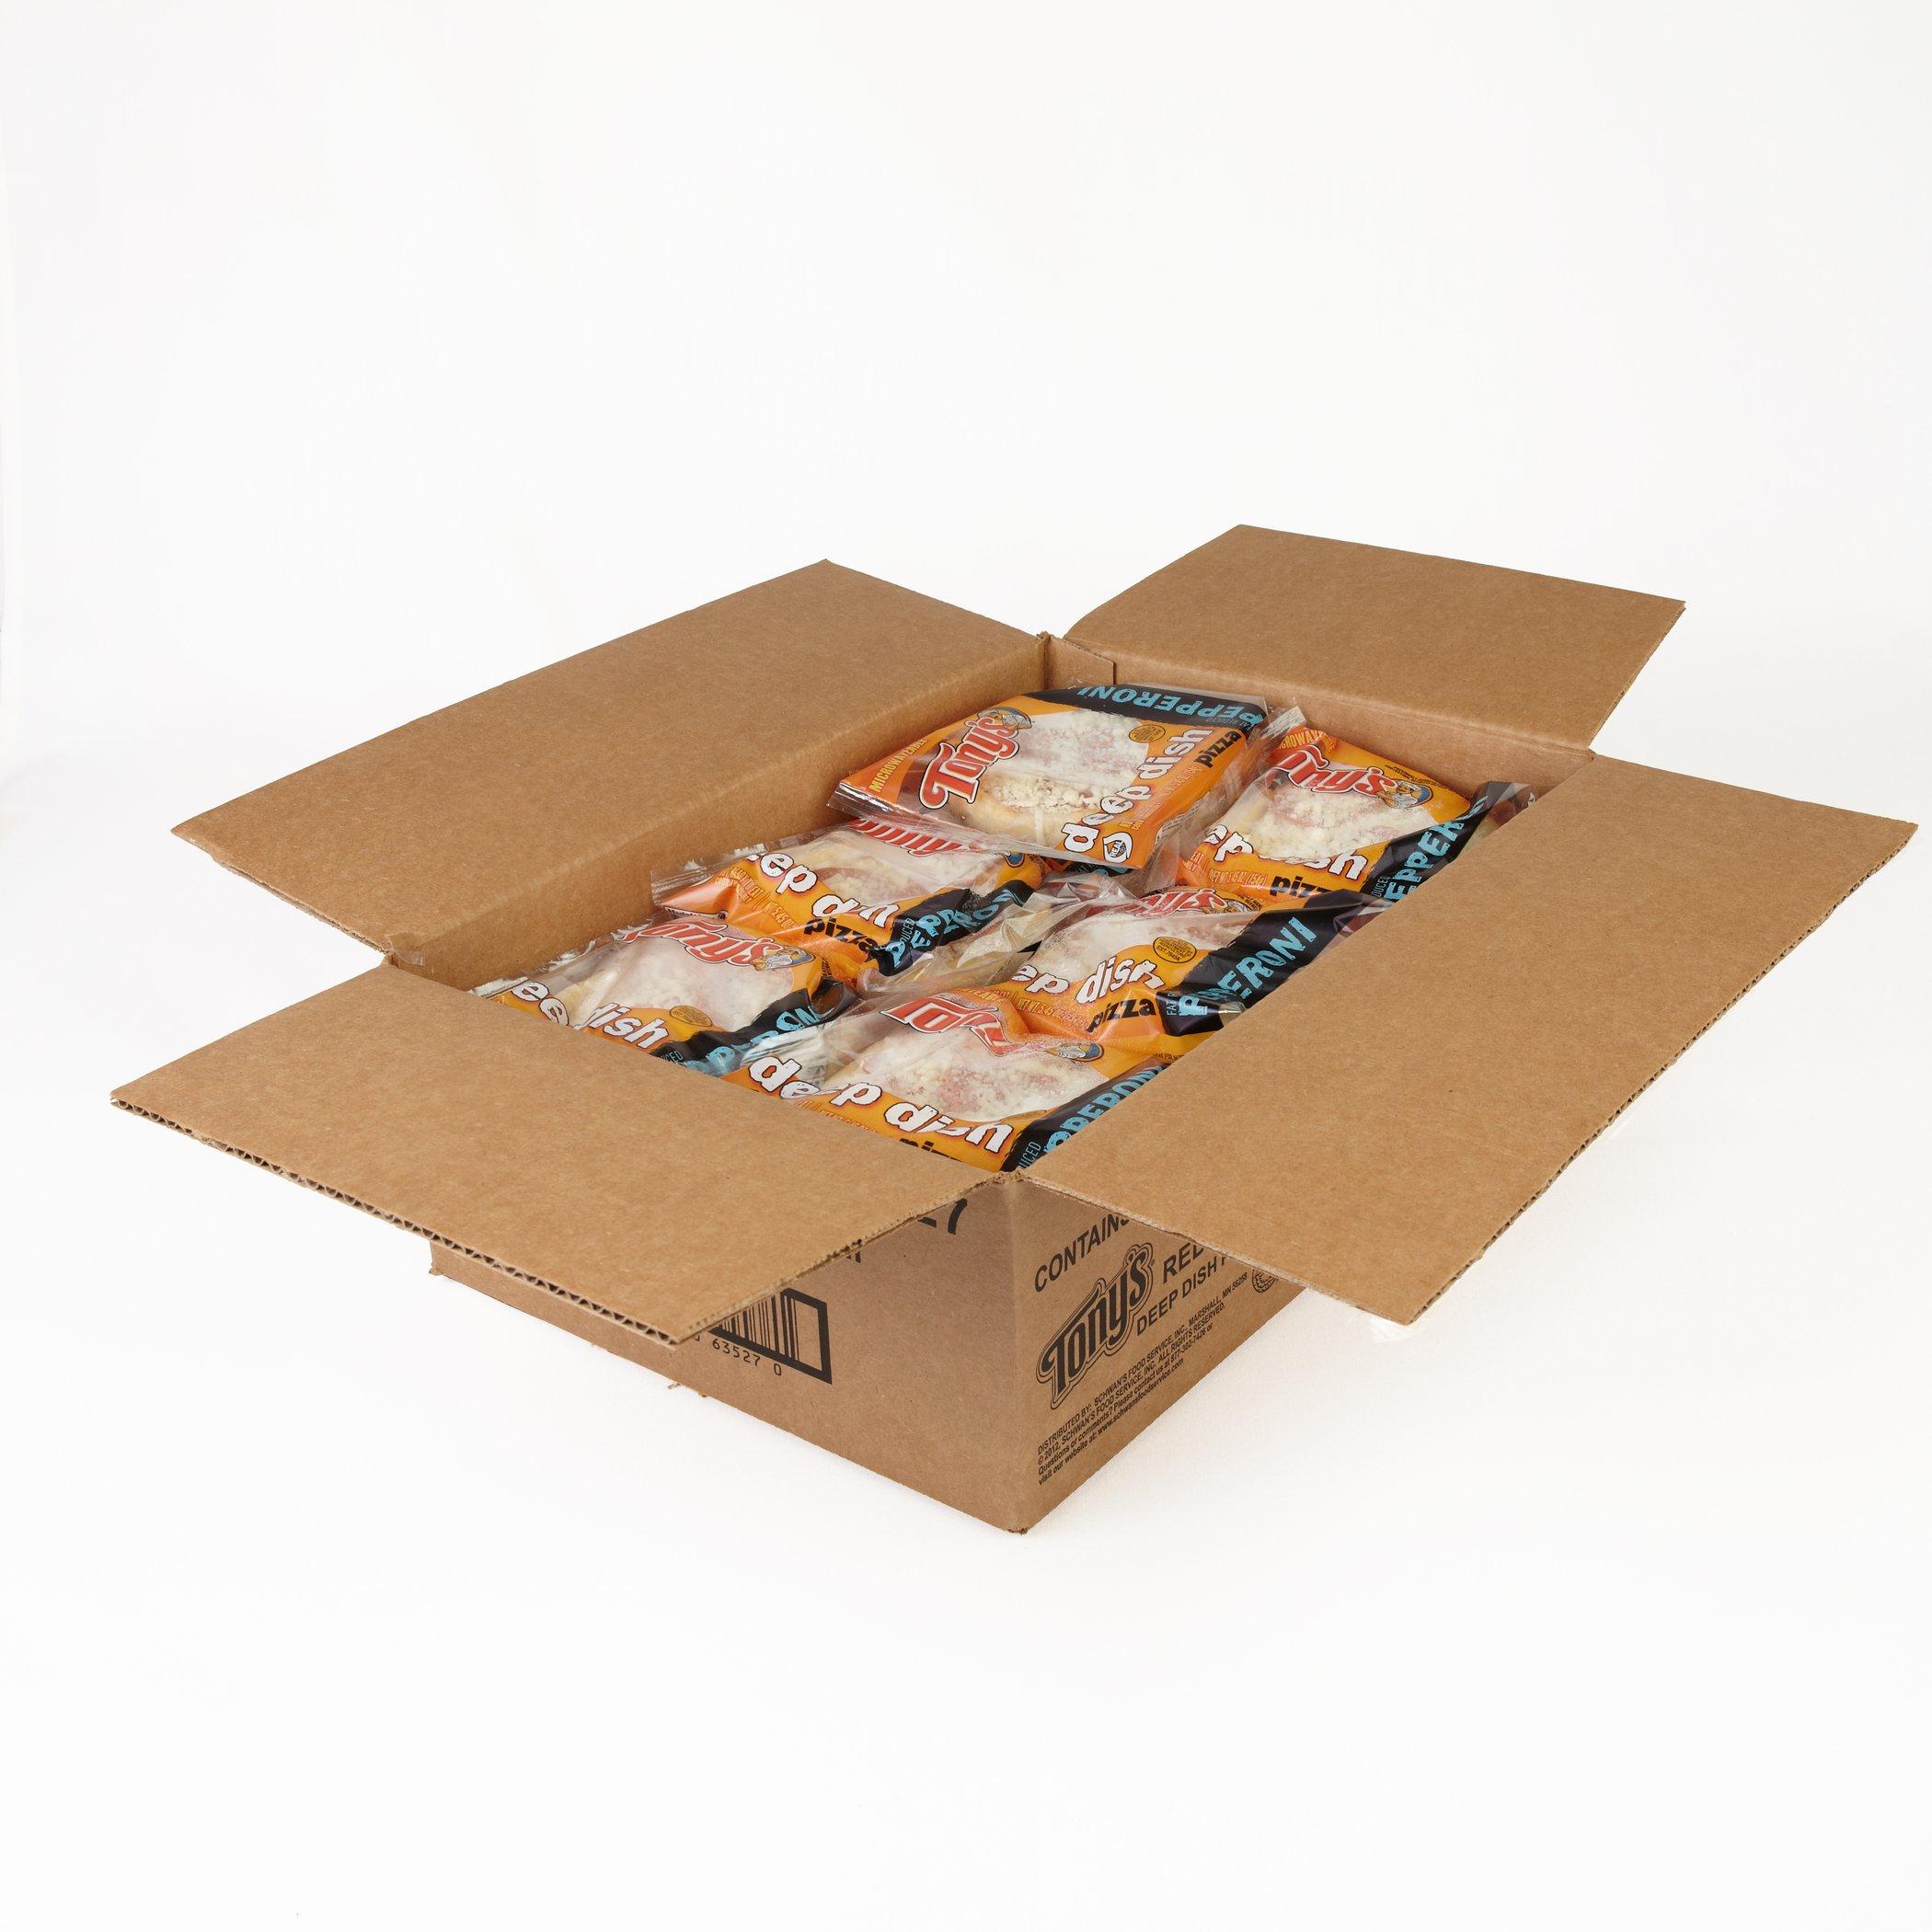 Tony's Deep Dish, Pepperoni Pizza, 5.45 oz, (24 count)